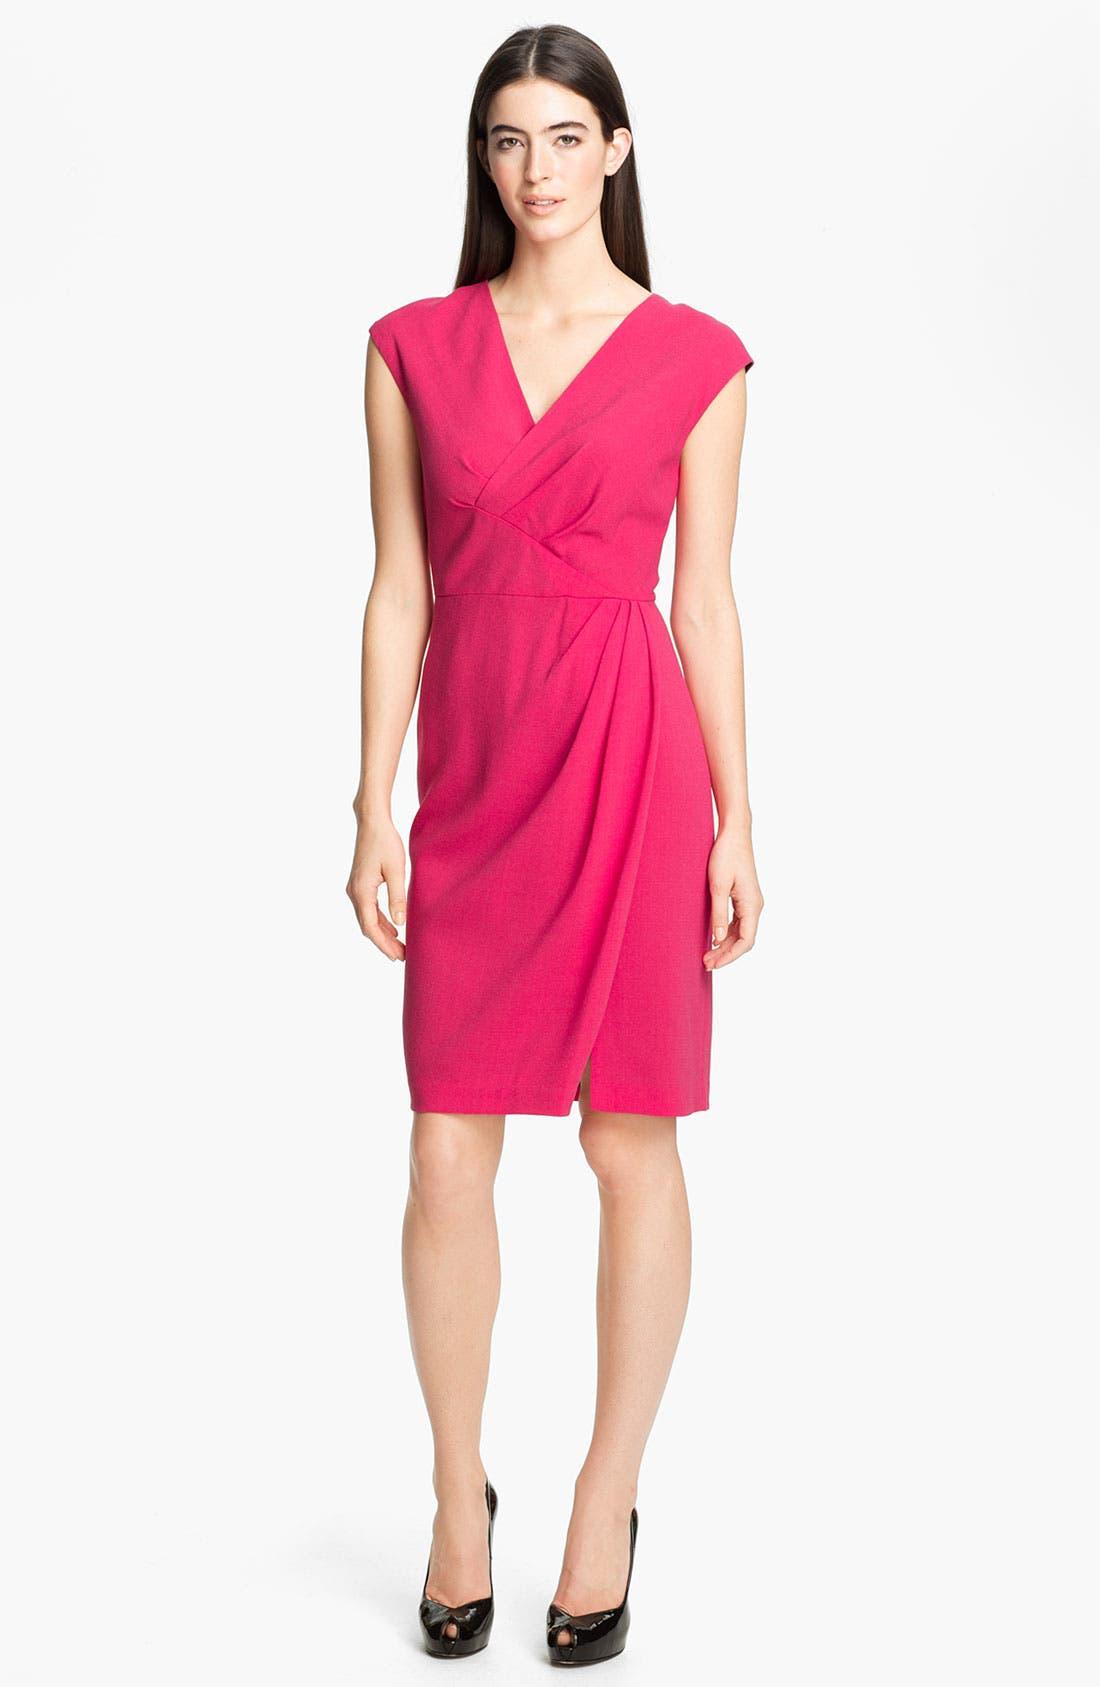 Main Image - Lafayette 148 New York 'Elsa - Astute Crepe' Dress